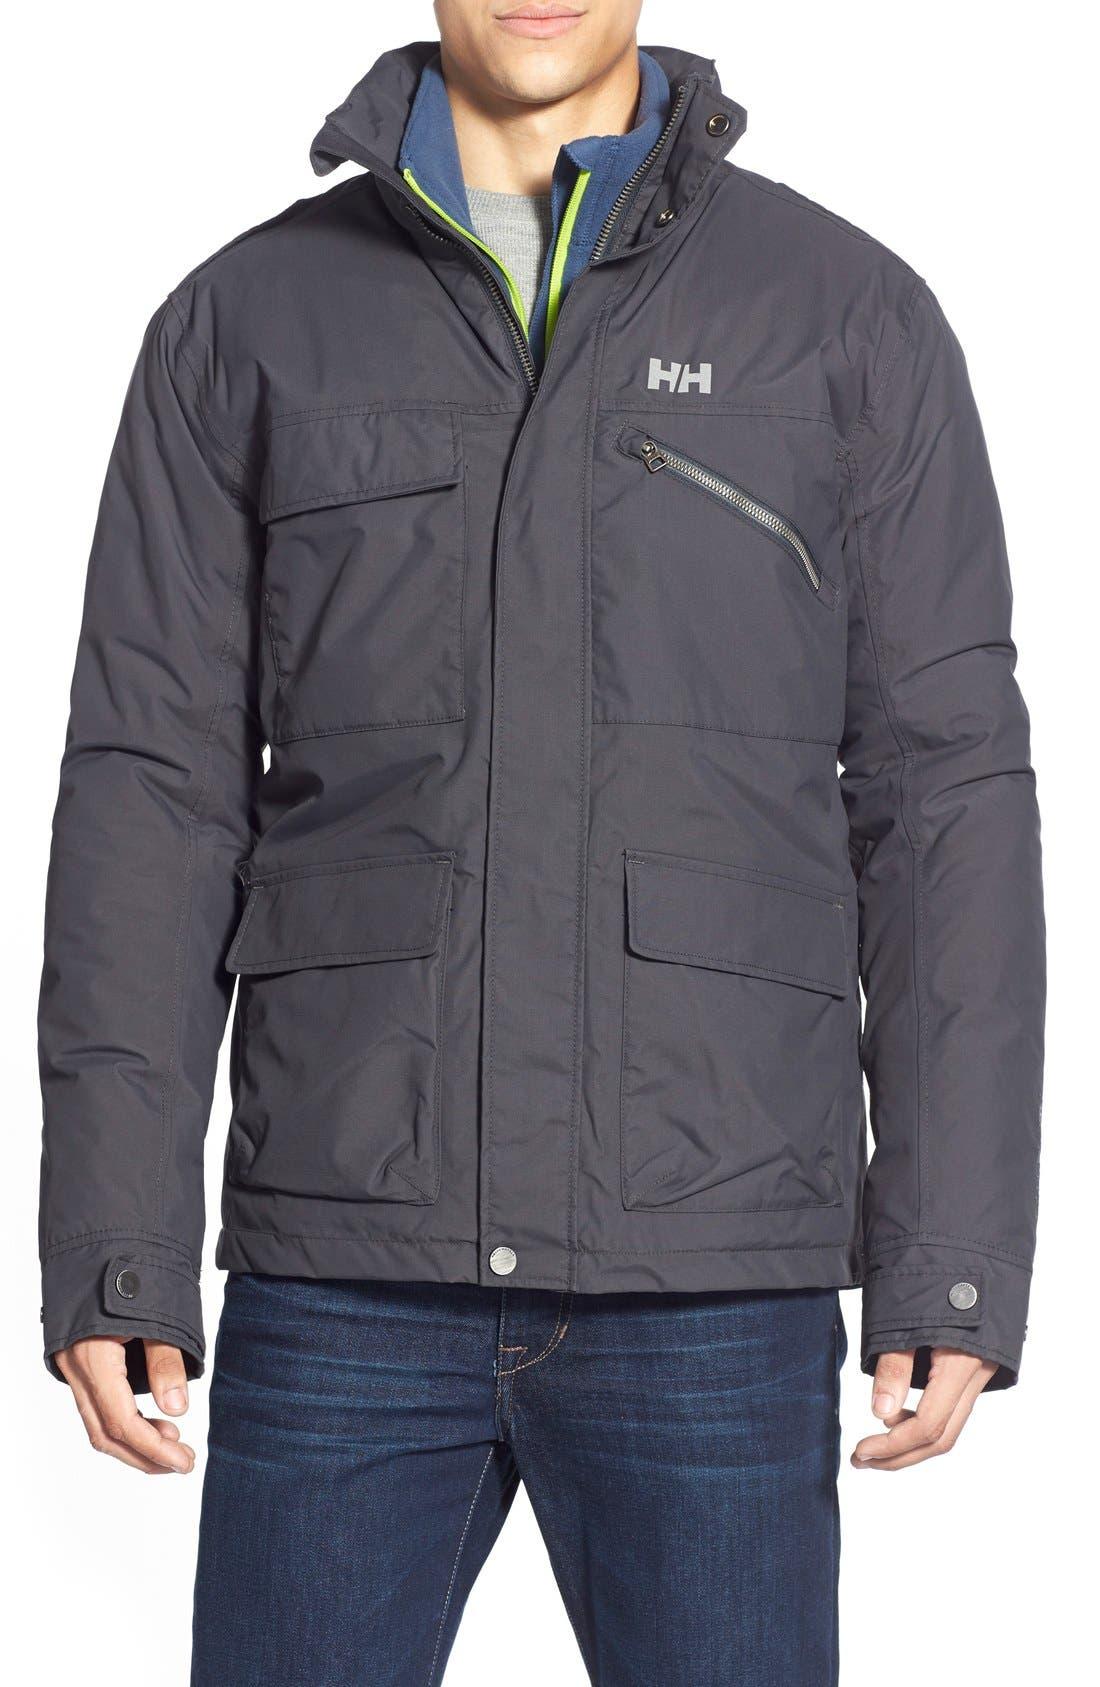 Alternate Image 1 Selected - HellyHansen 'Universal' MotoRain Jacket